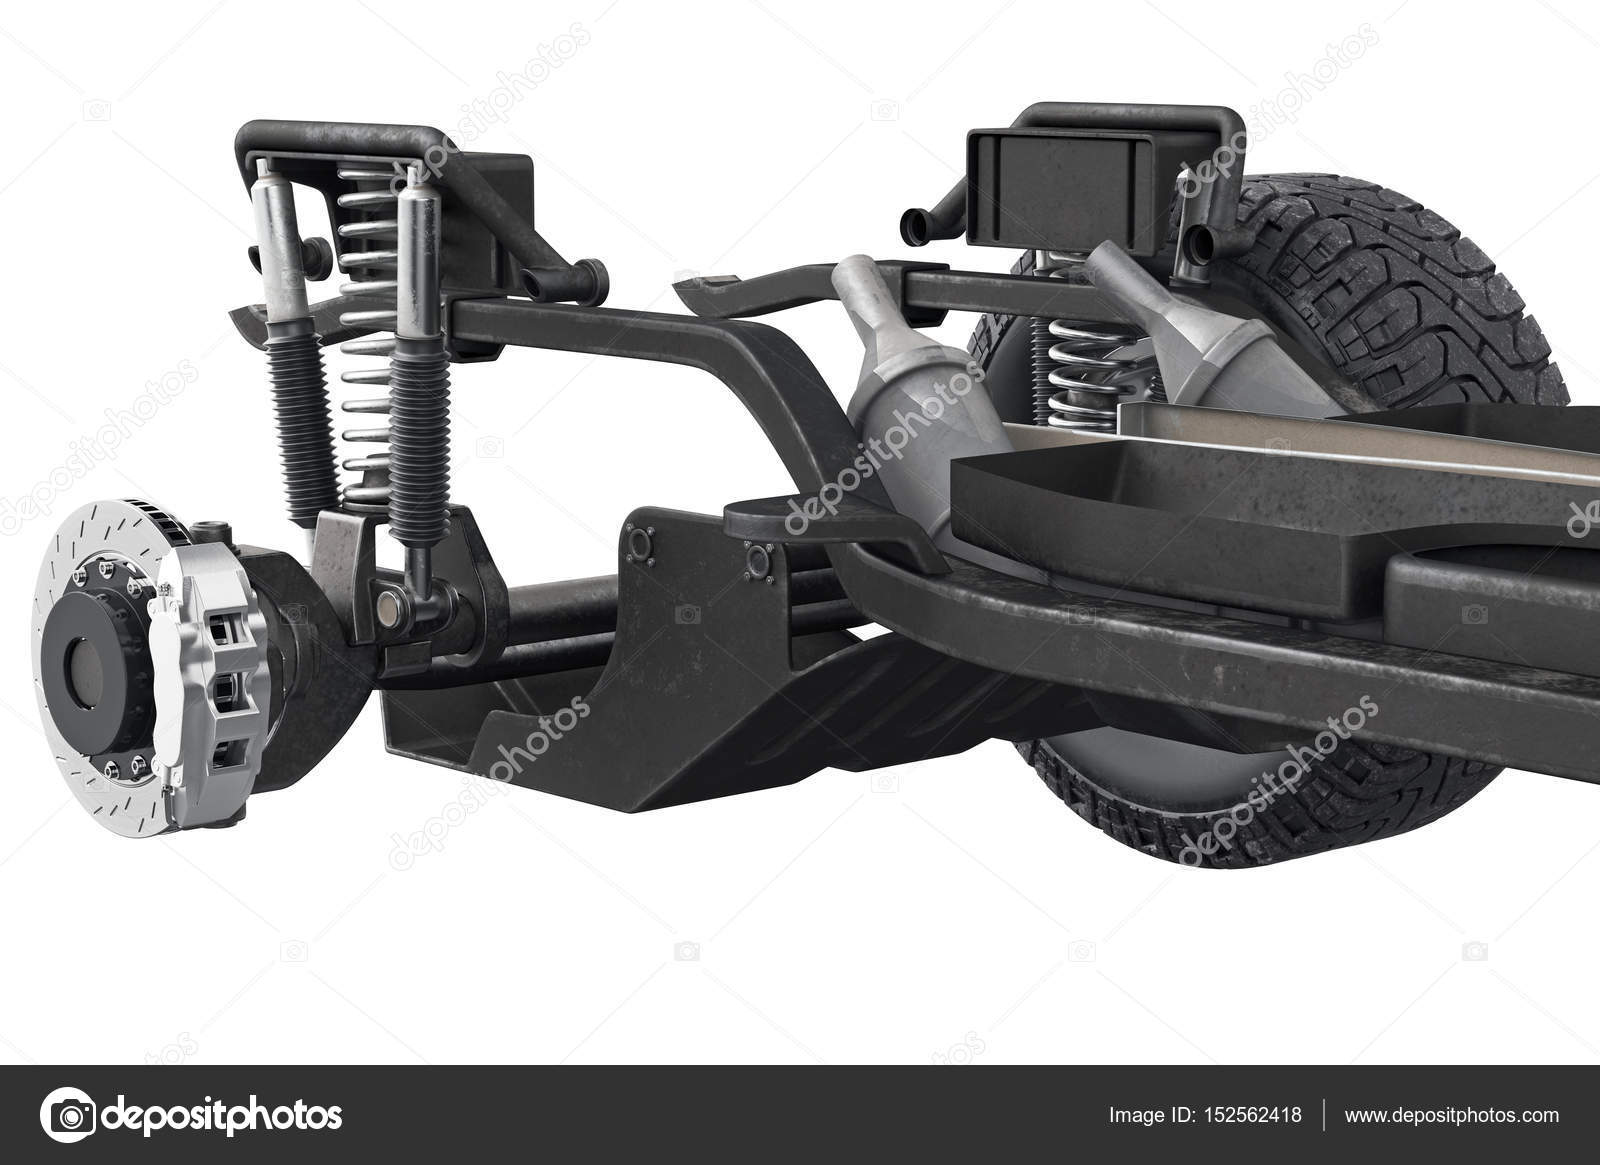 Chasis eje de marco, visión cercana — Fotos de Stock © ARTYuSTUDIO ...